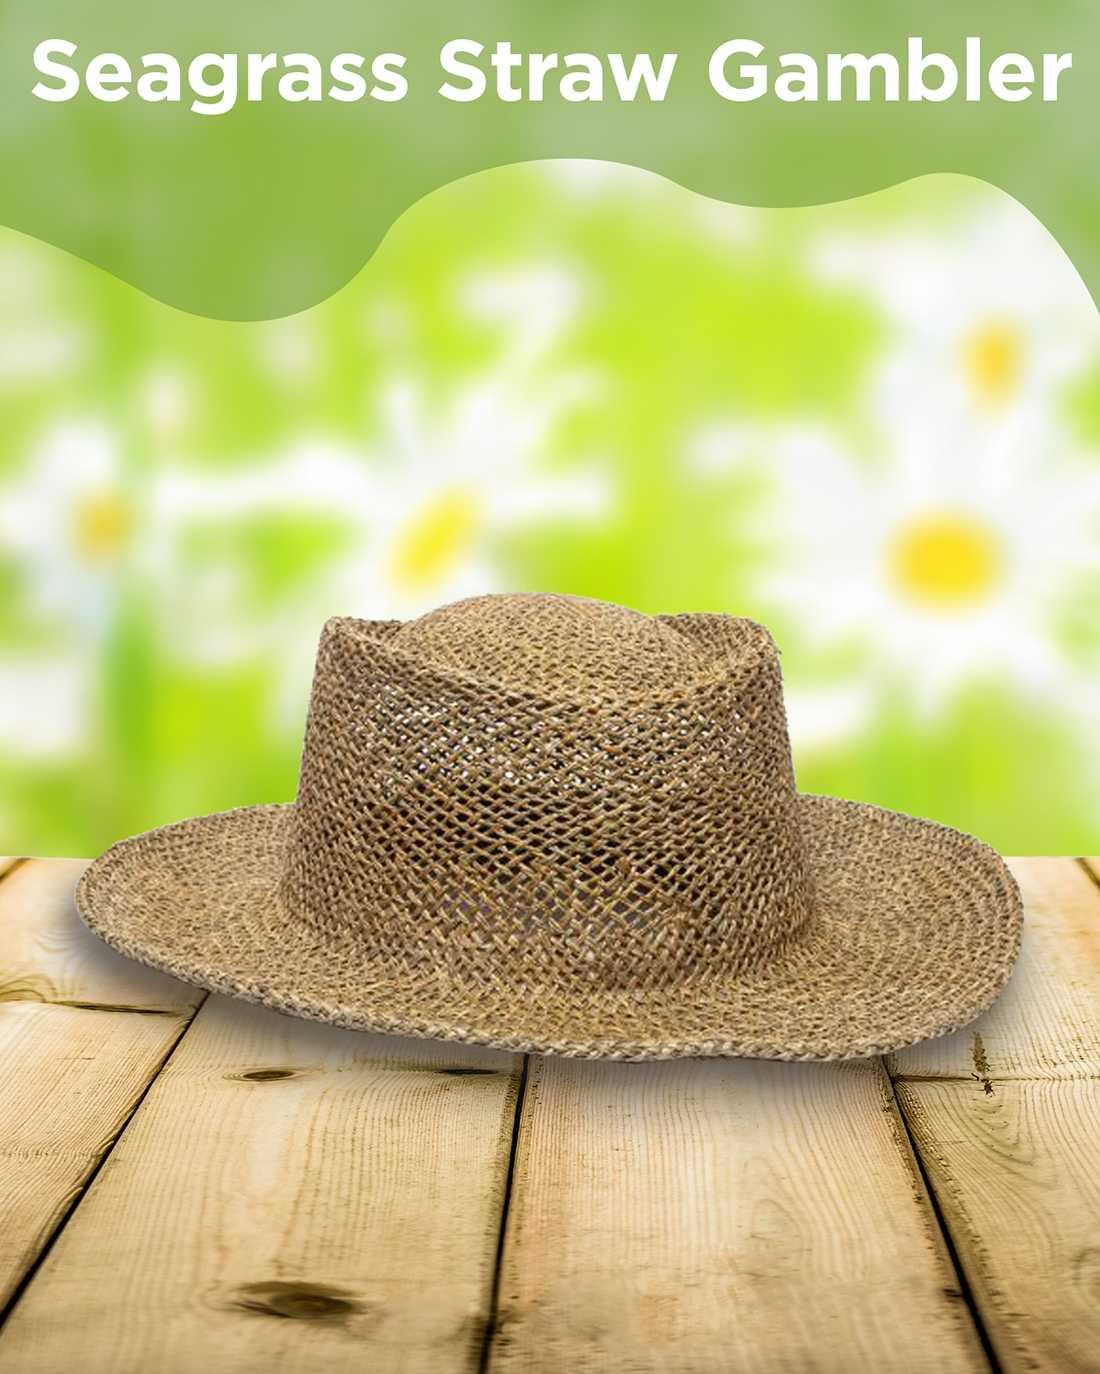 Seagrass Straw Gambler AIM